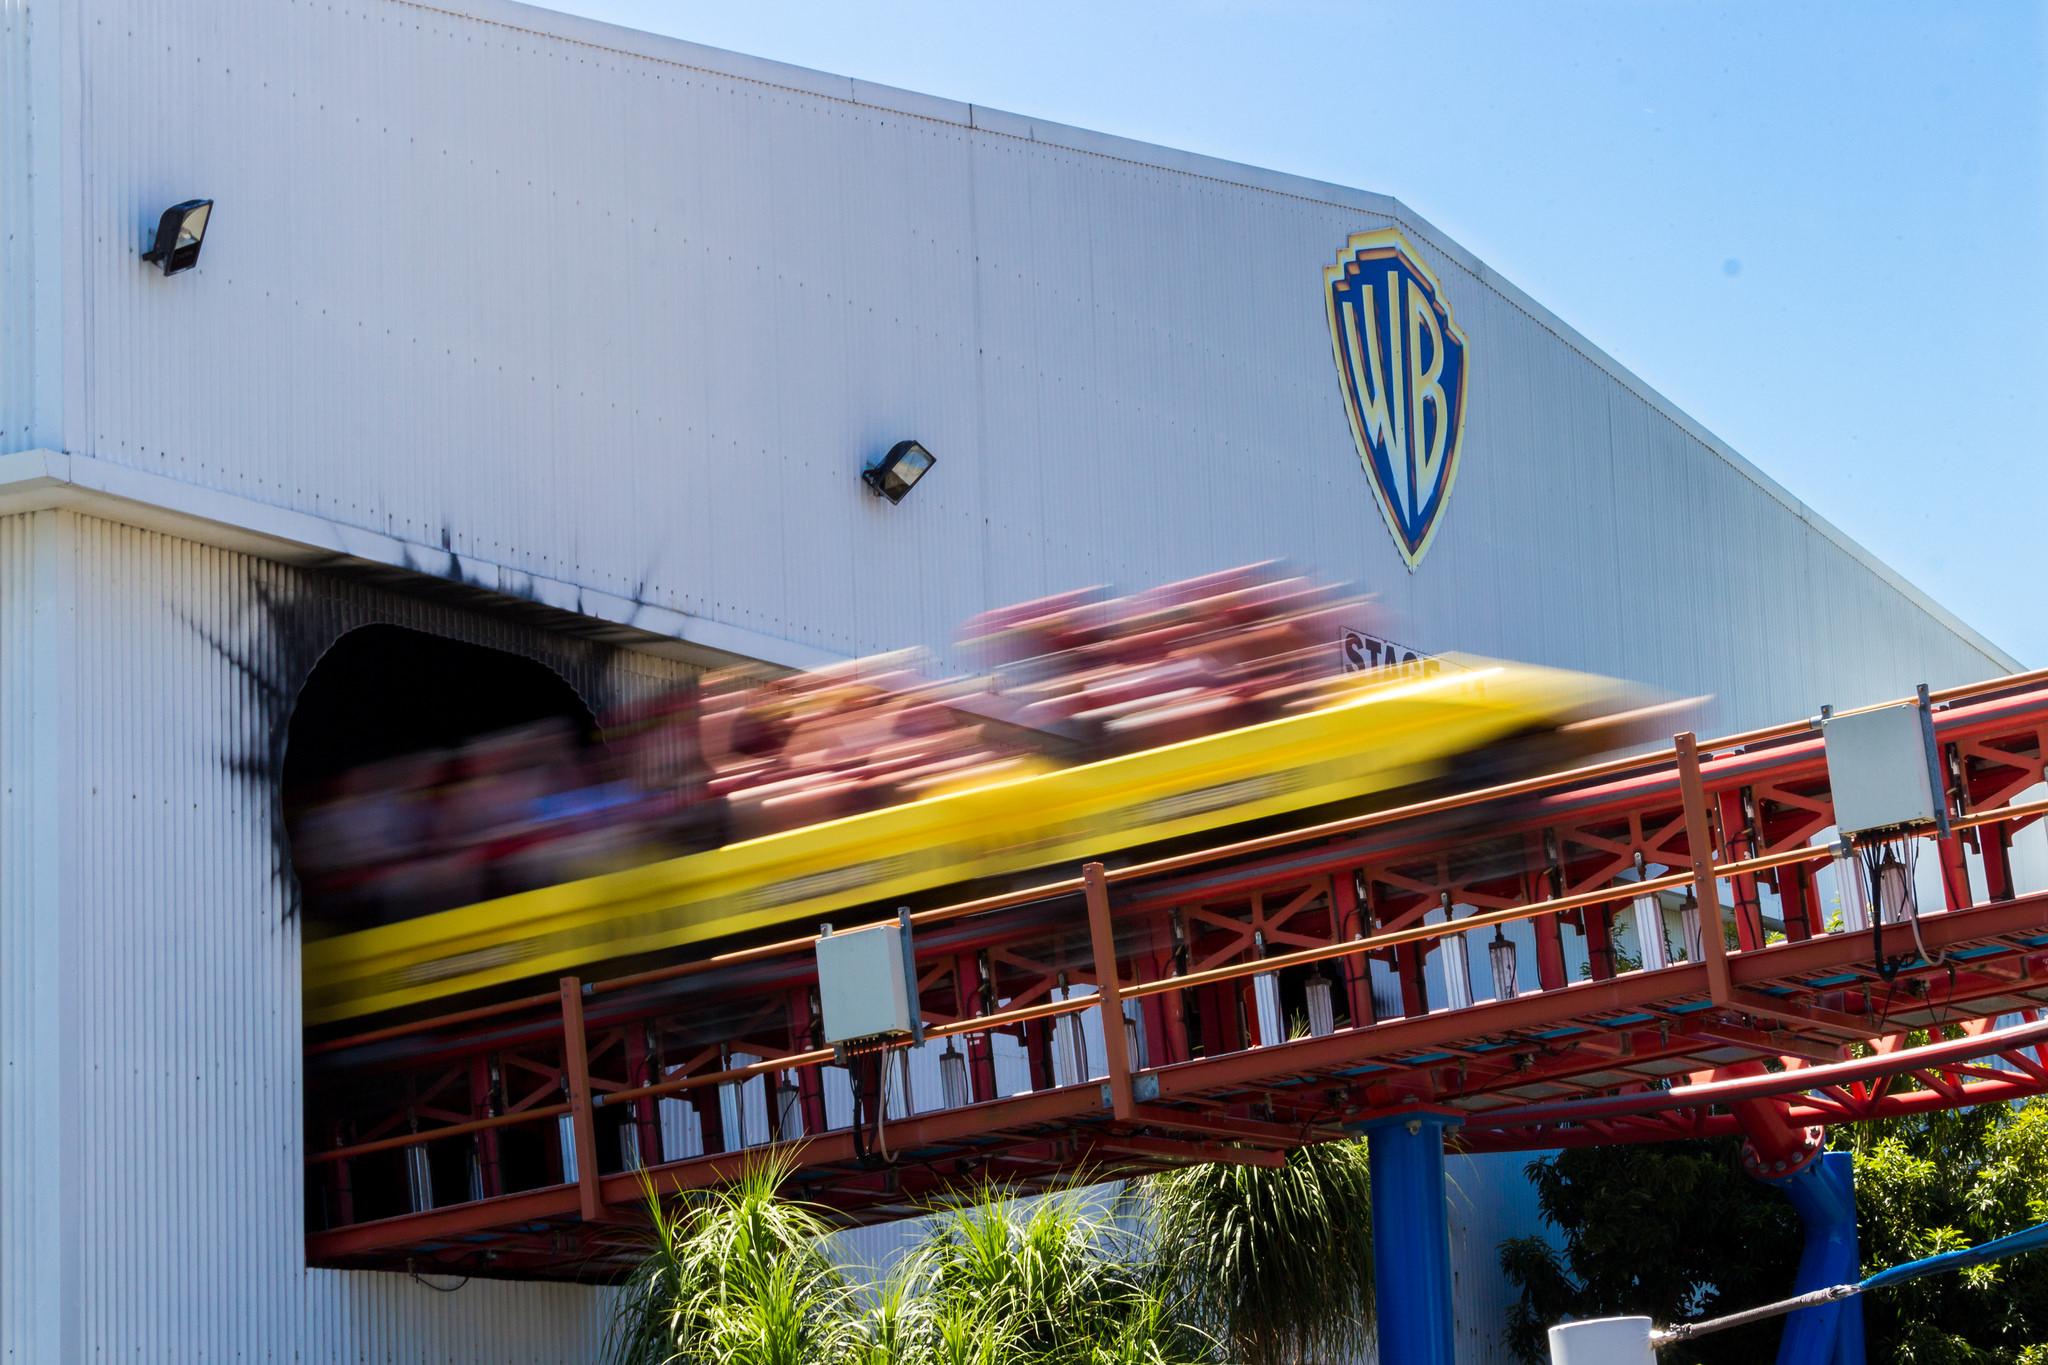 Superman Coaster - Warner Brothers Movie World, Australia